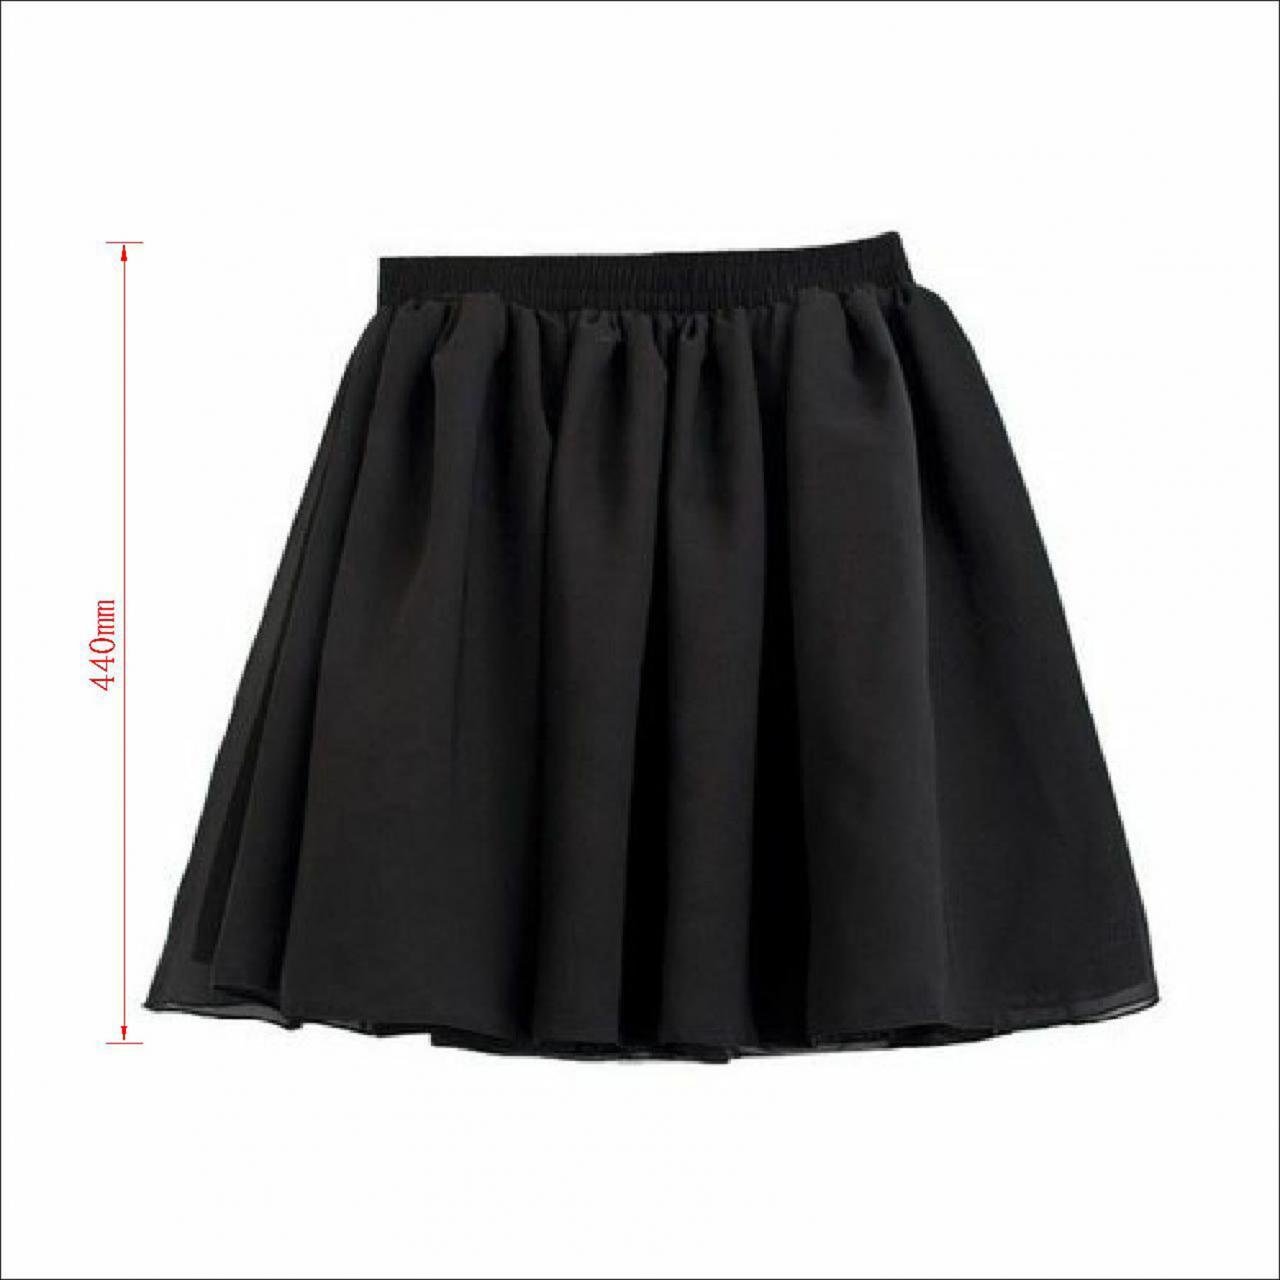 Vogue Lady Retro High Waist Pleated Double Layer Chiffon Short Mini Skirts Dress on Luulla